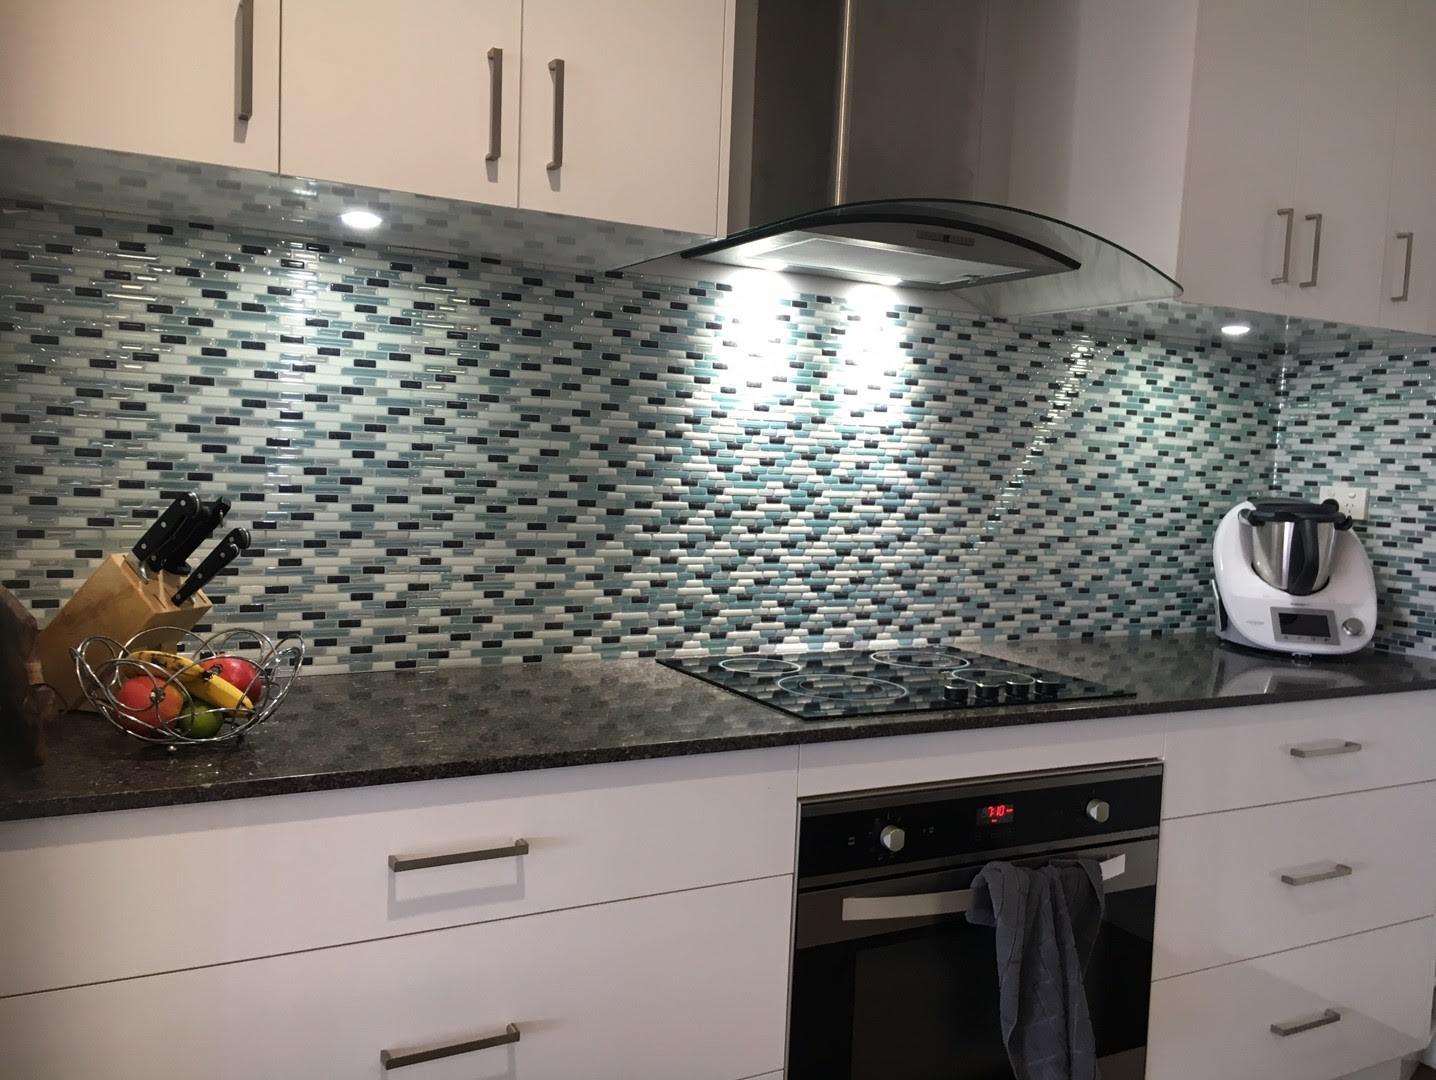 - Como Mare, 5 Premium Anti Mold Peel And Stick Wall Tile Backsplash